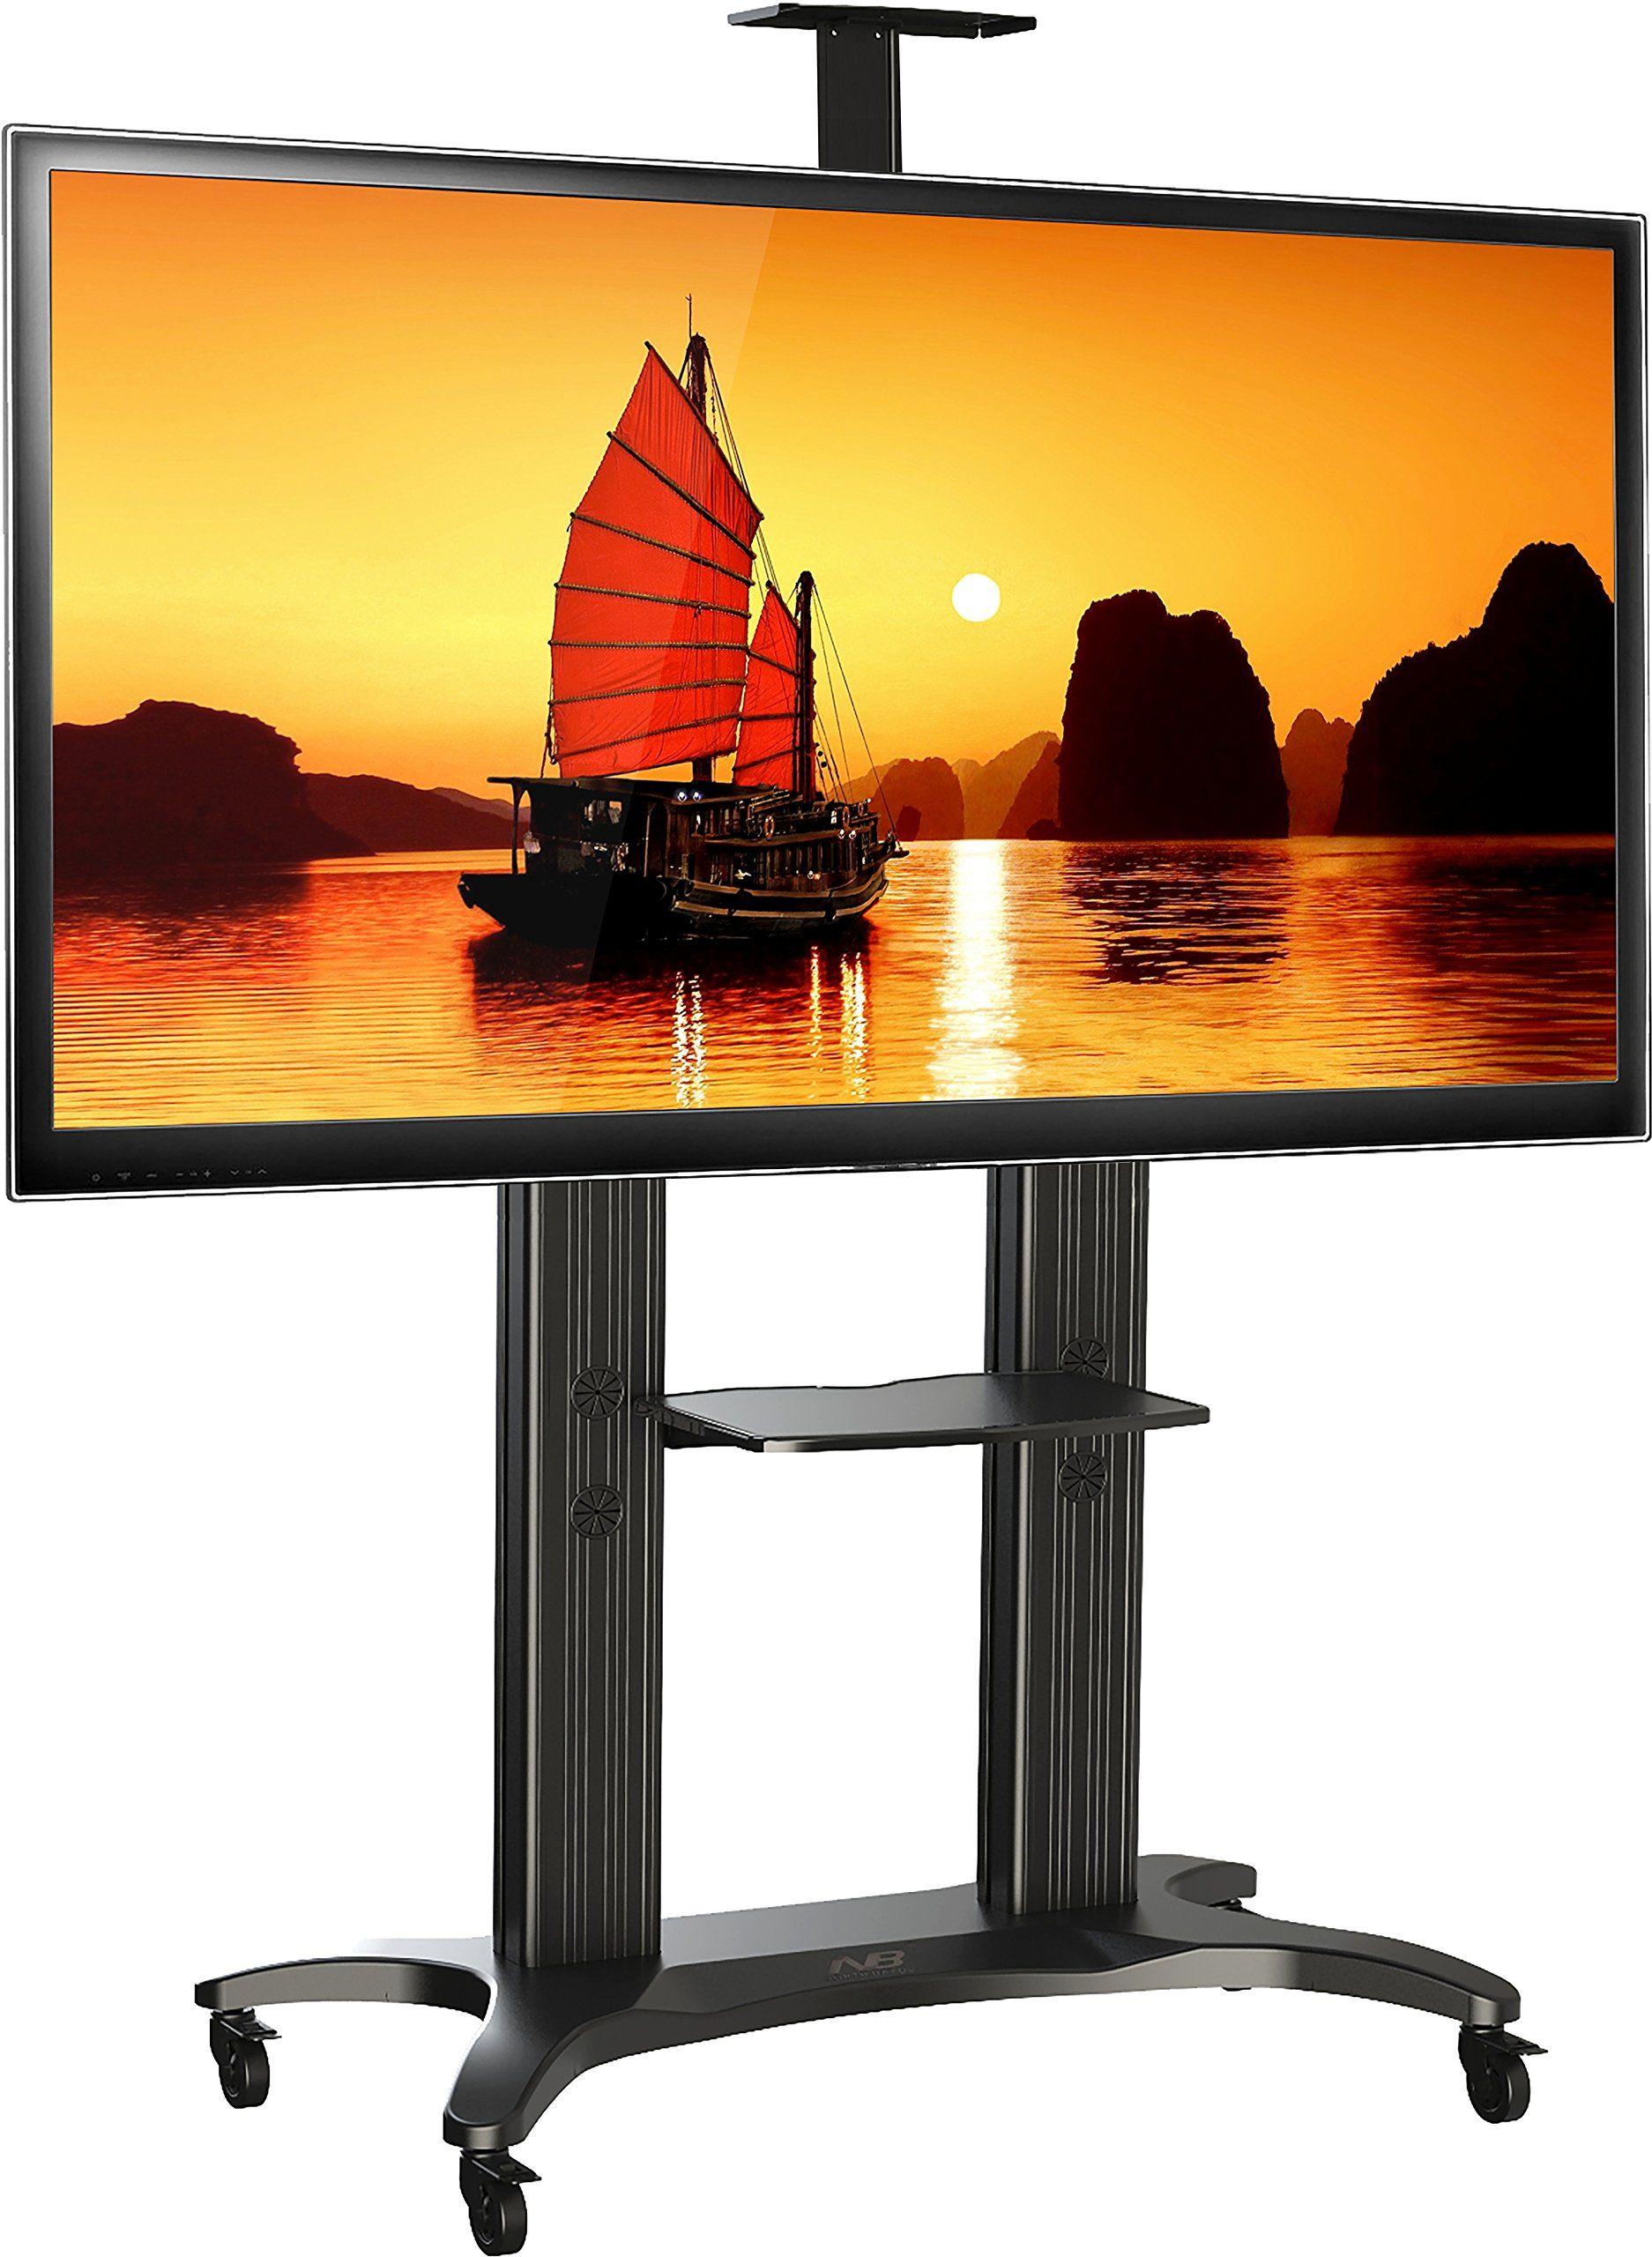 North Bayou Tv Stand For Flat Screens 55 80 Inch Lcd Led Oled Plasma